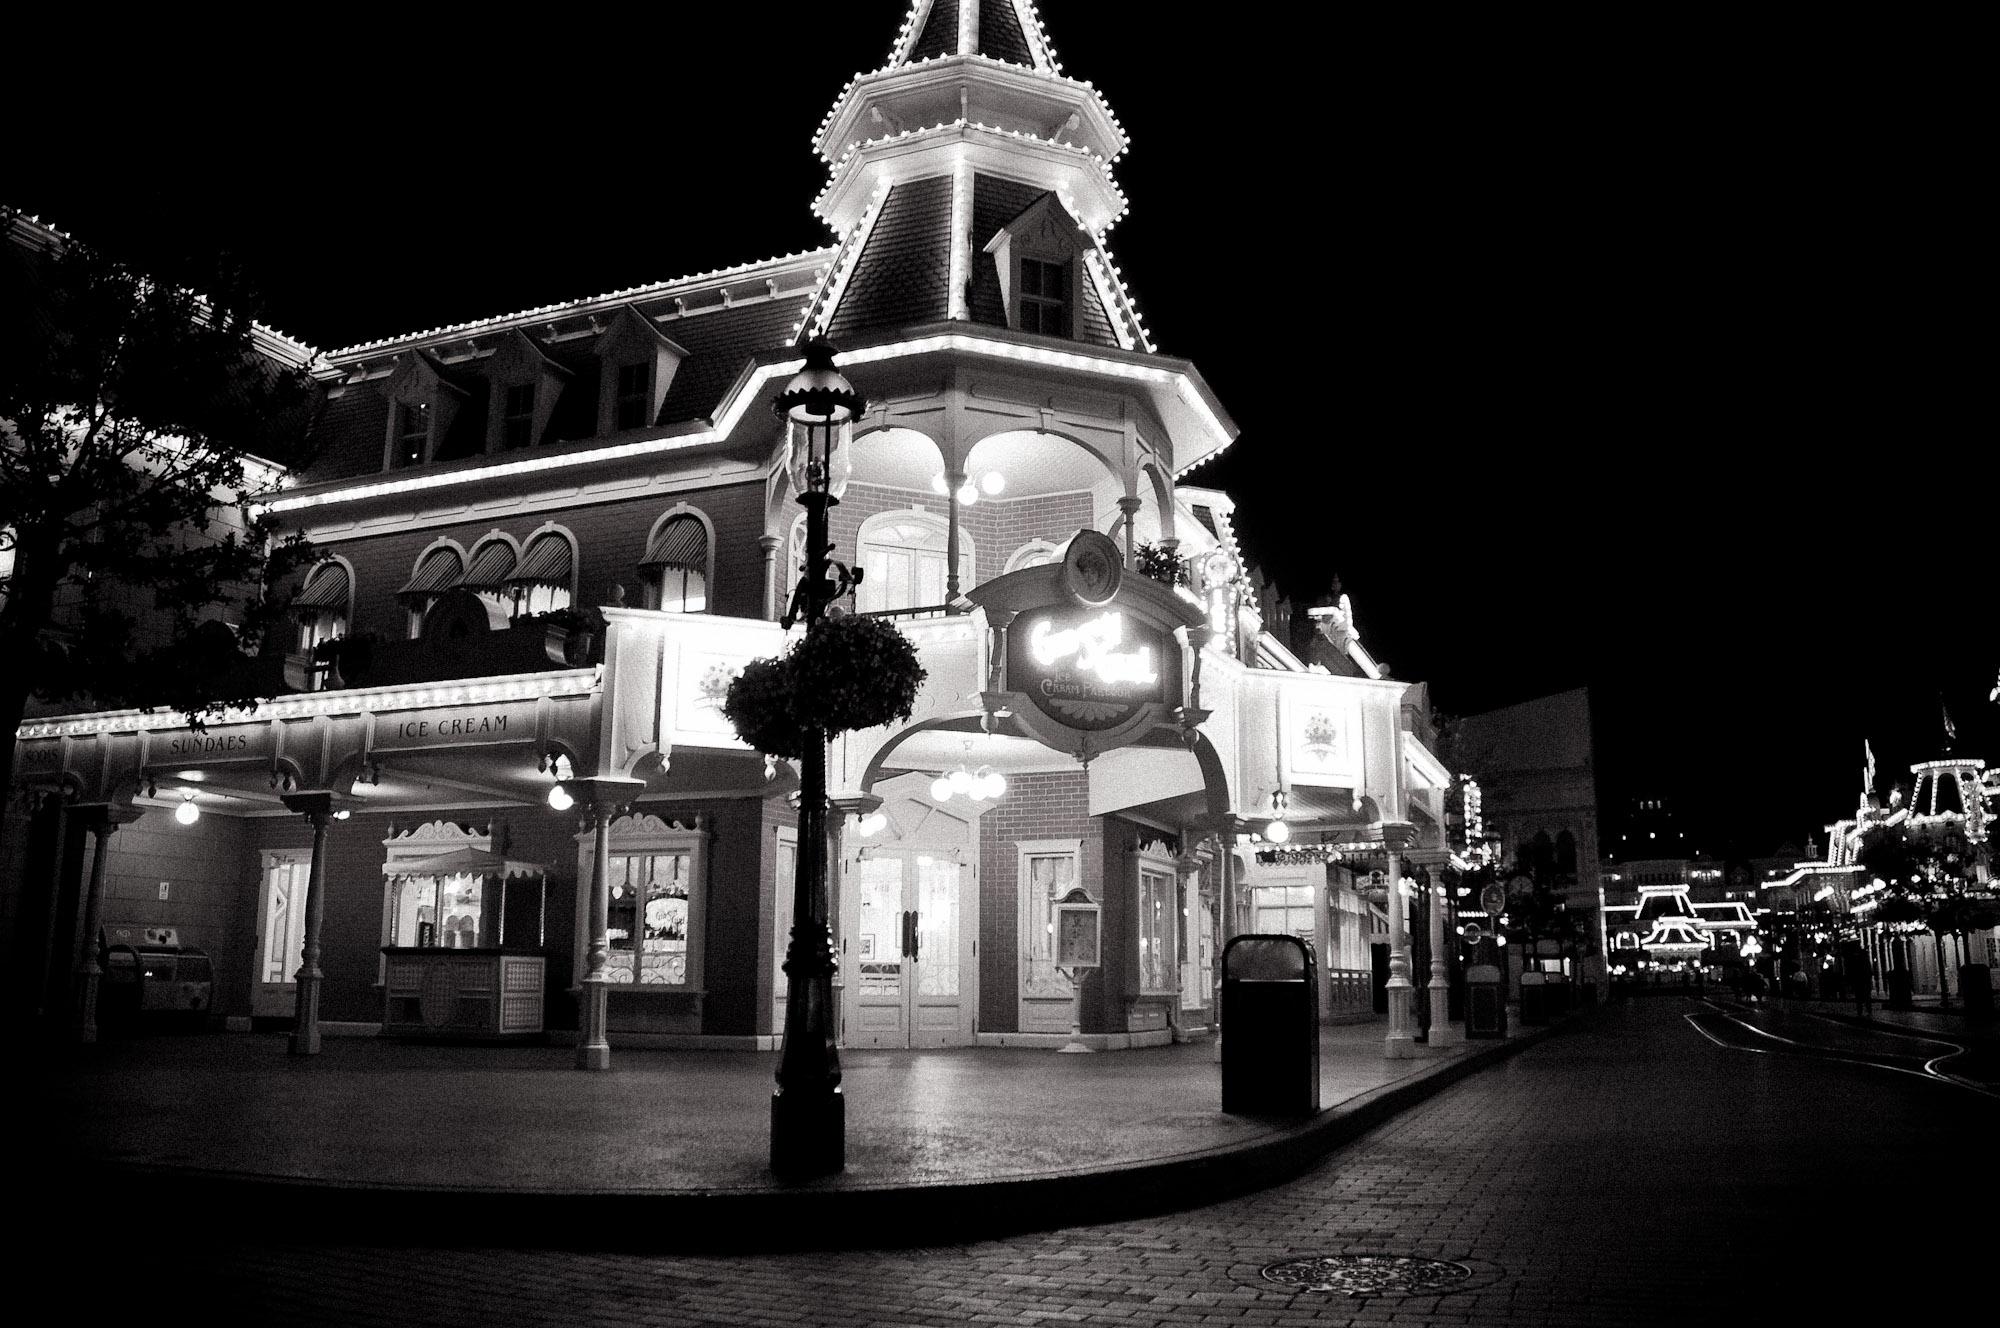 disneyland-paris-black-white-14